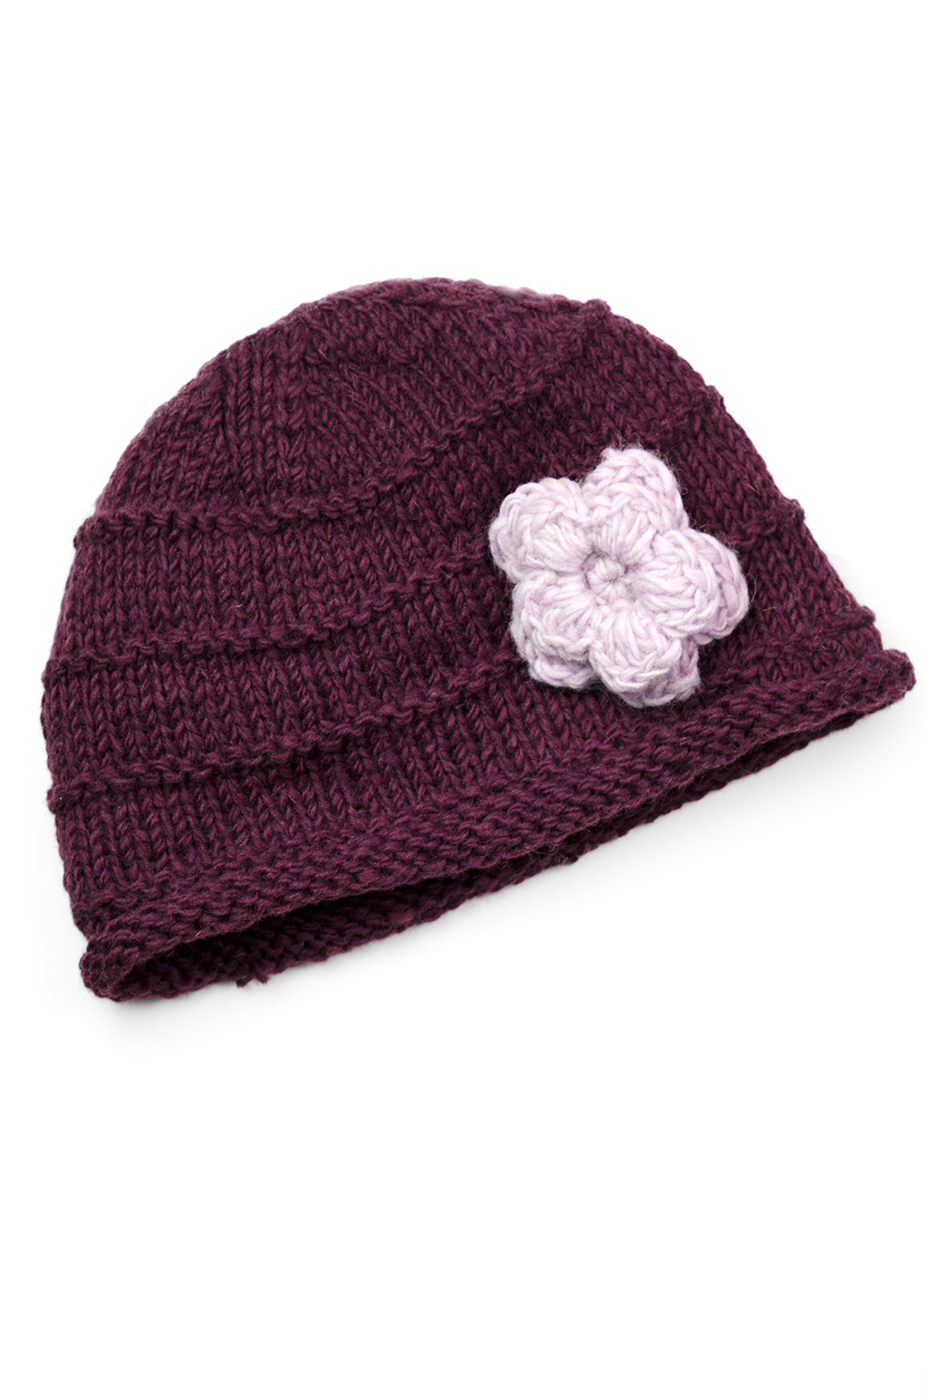 Plum & Pink Hat